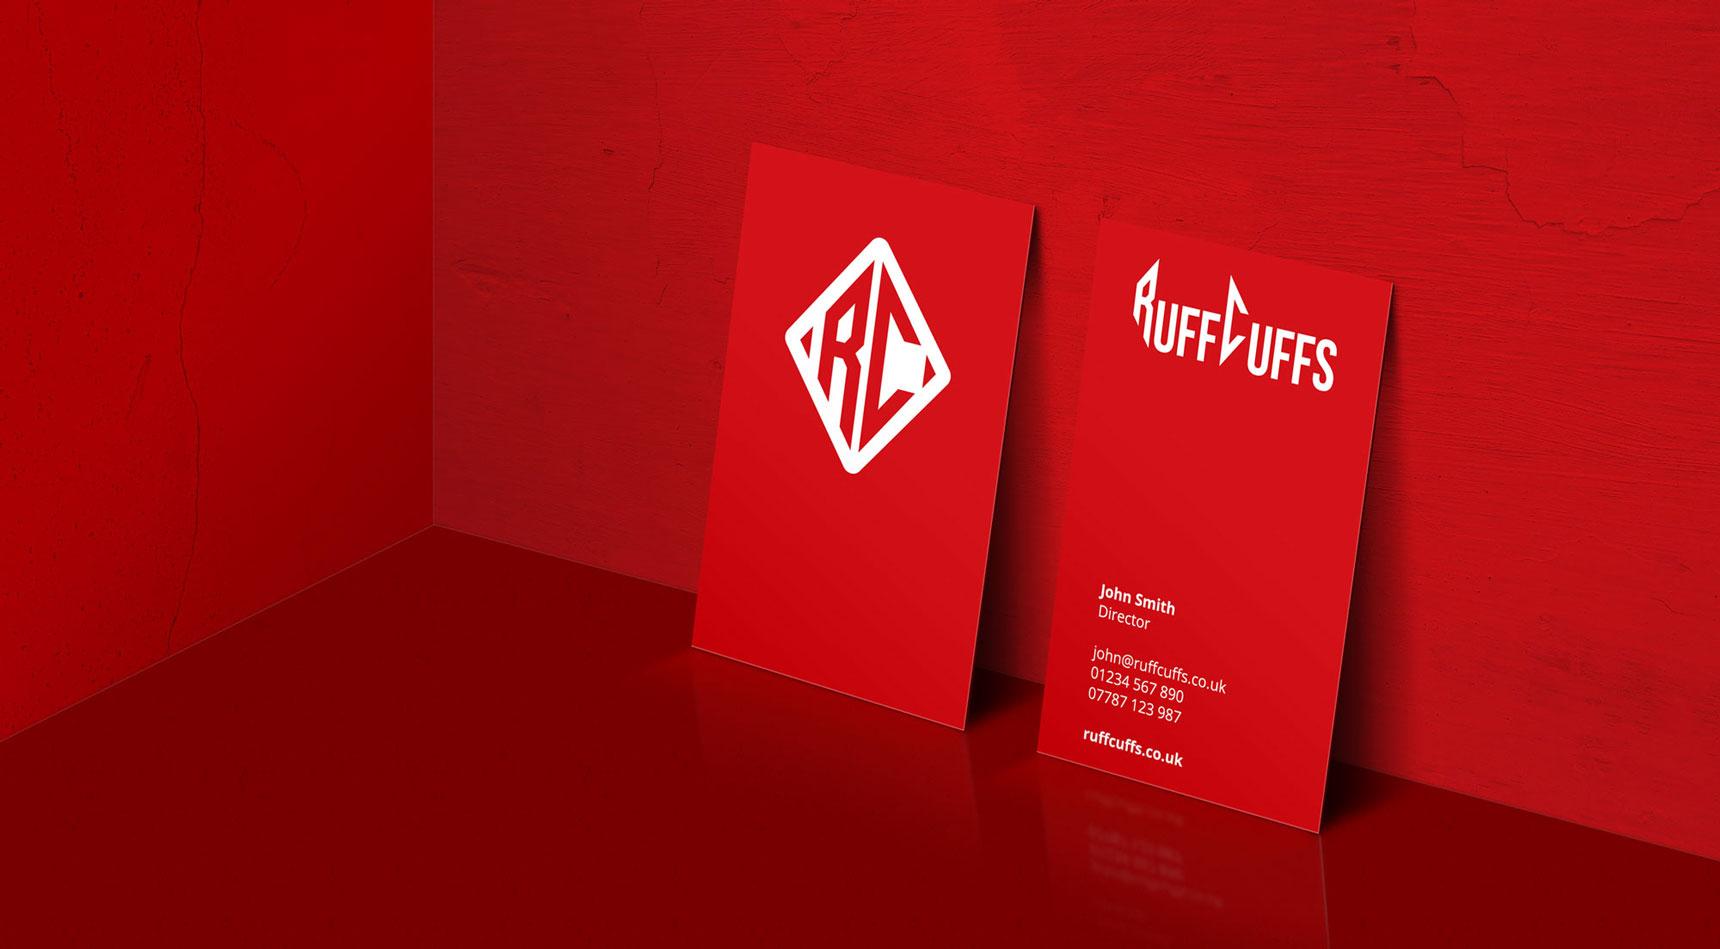 Ruff Cuffs Business Card Design and Branding by Nous Digital Gloucester